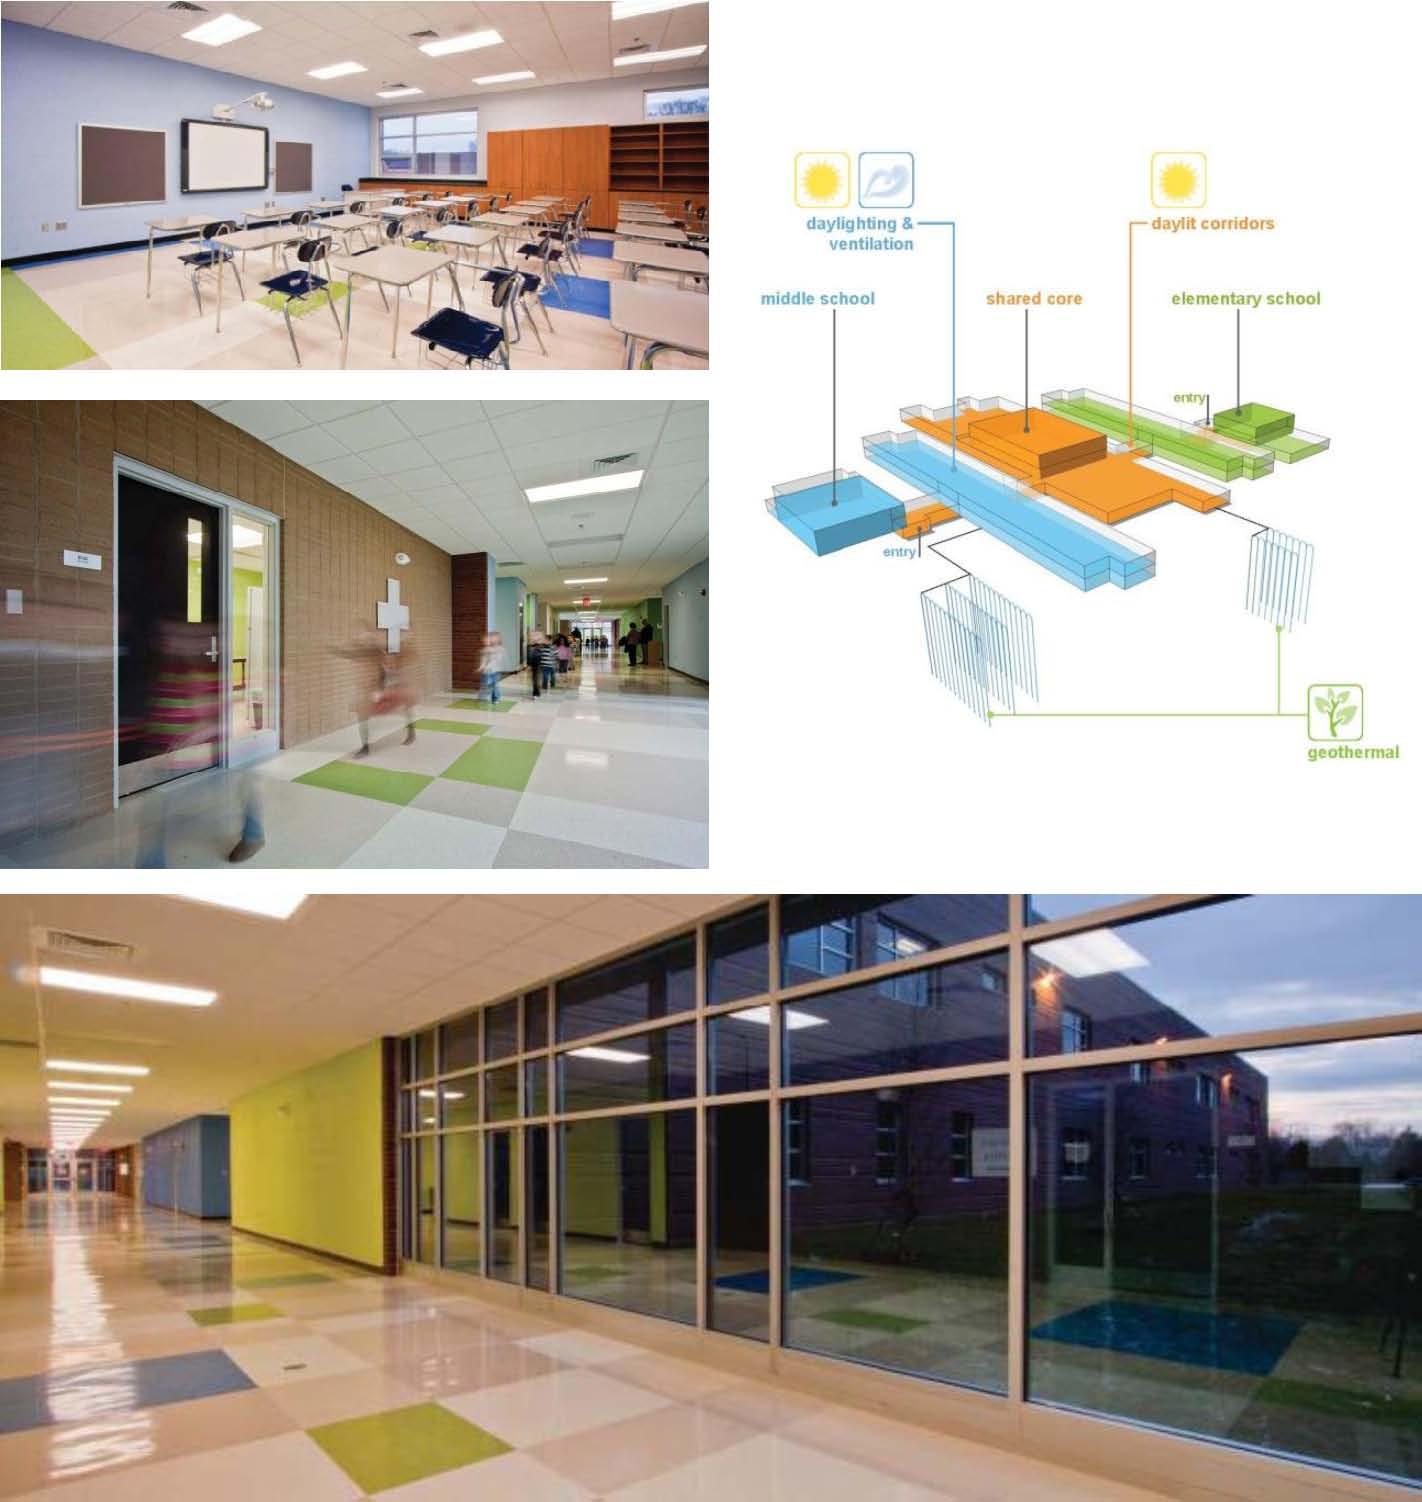 80 Interior Design Programs Tennessee Interior Design Schools And Degrees Best The